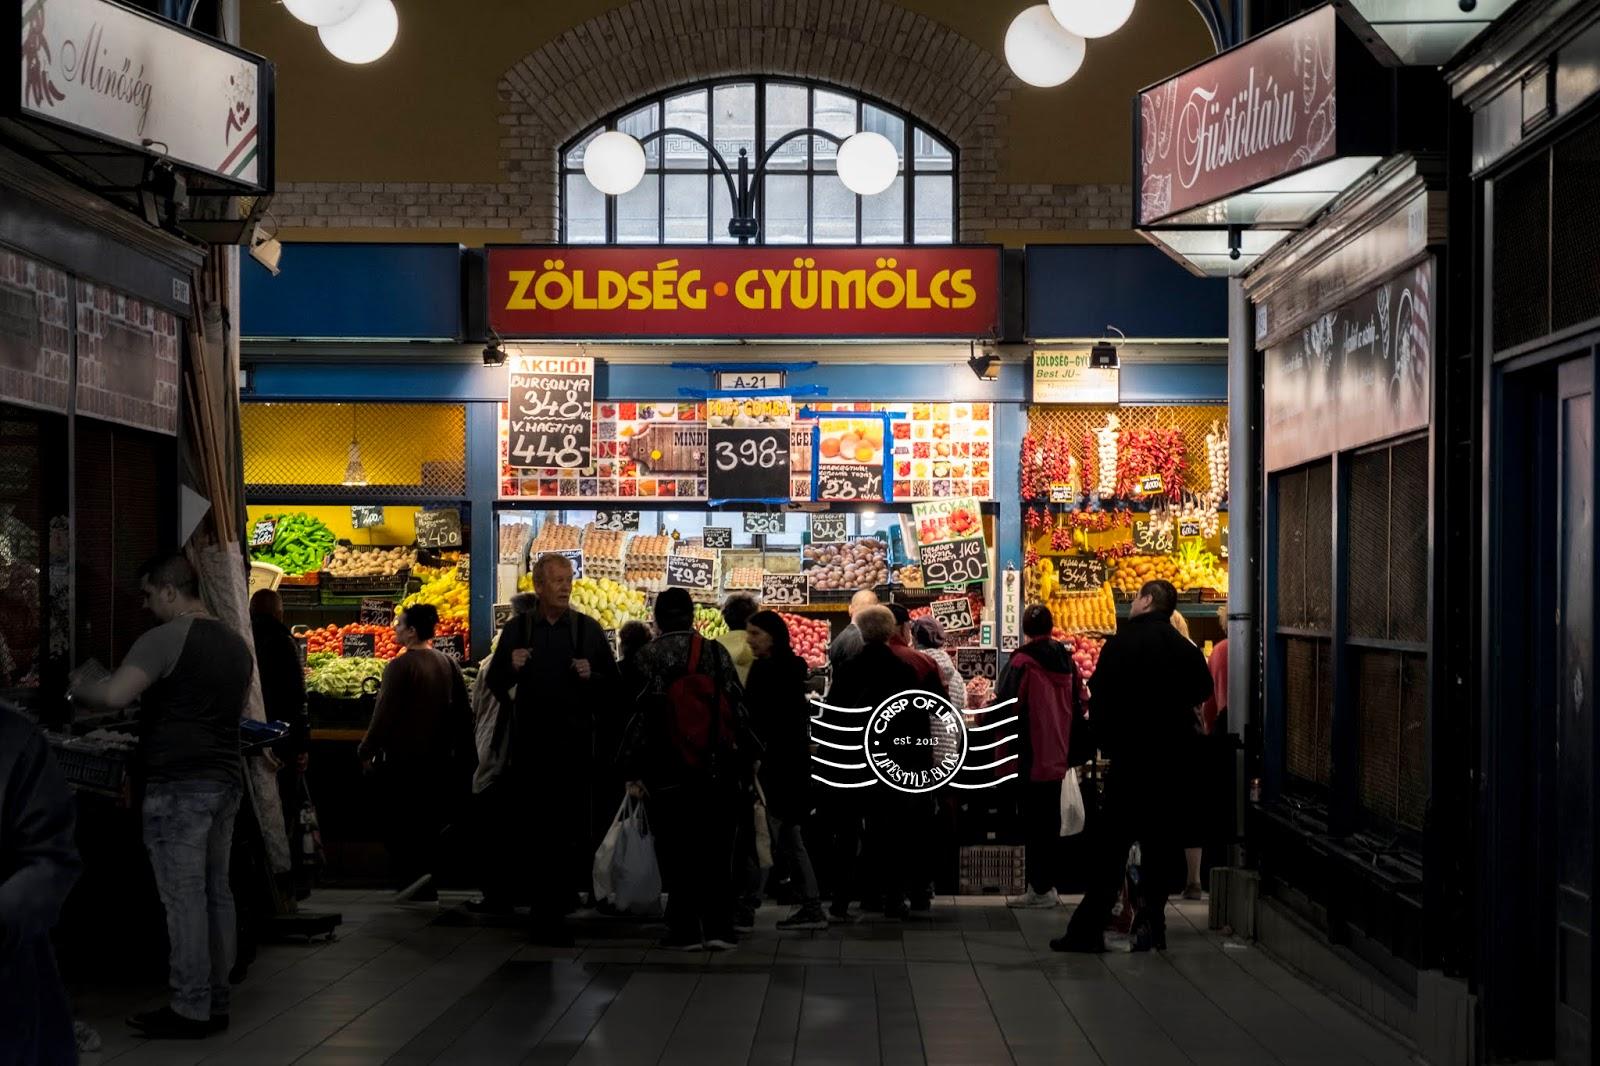 Budapest Central Market Hall (Nagyvásárcsarnok) @ Hungary